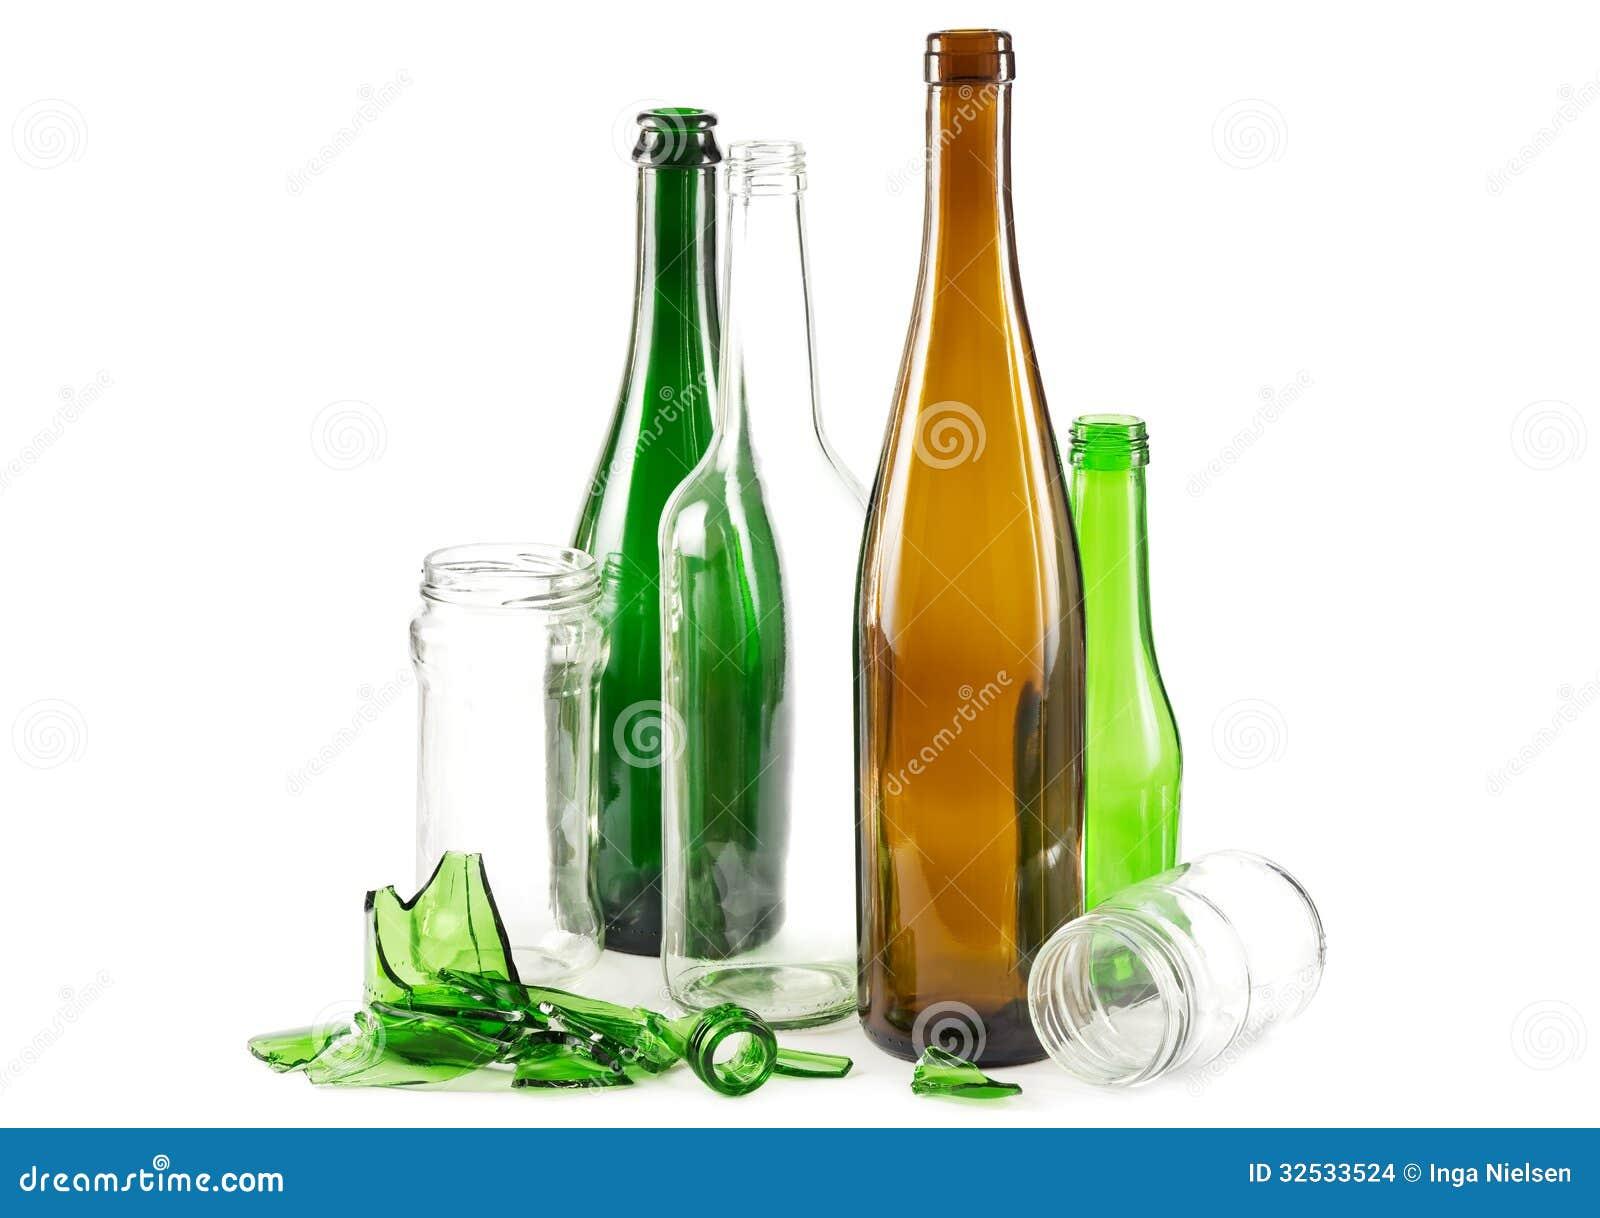 Broken Glass Waste Disposal